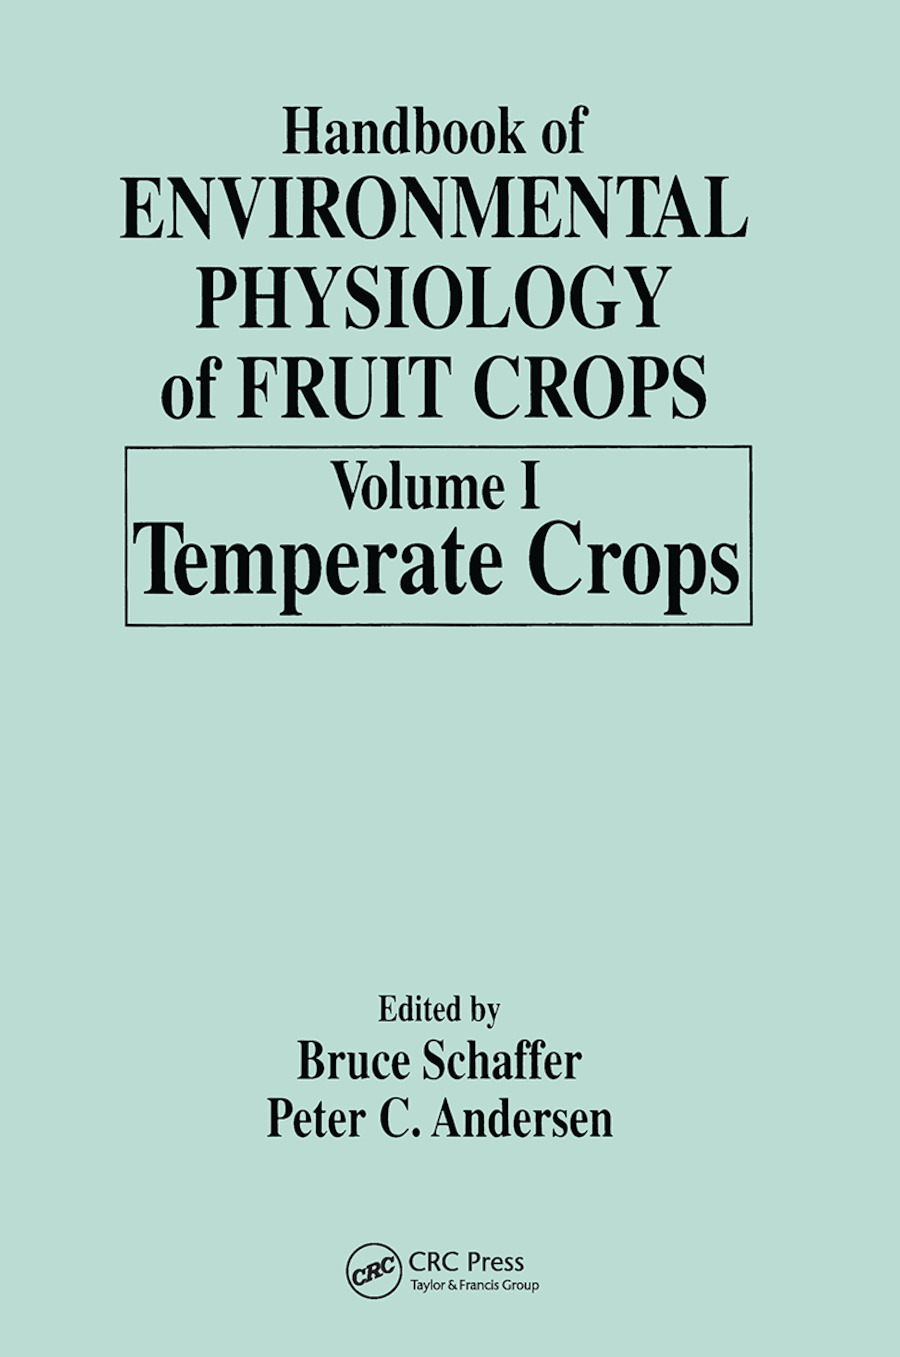 Handbook of Environmental Physiology of Fruit Crops